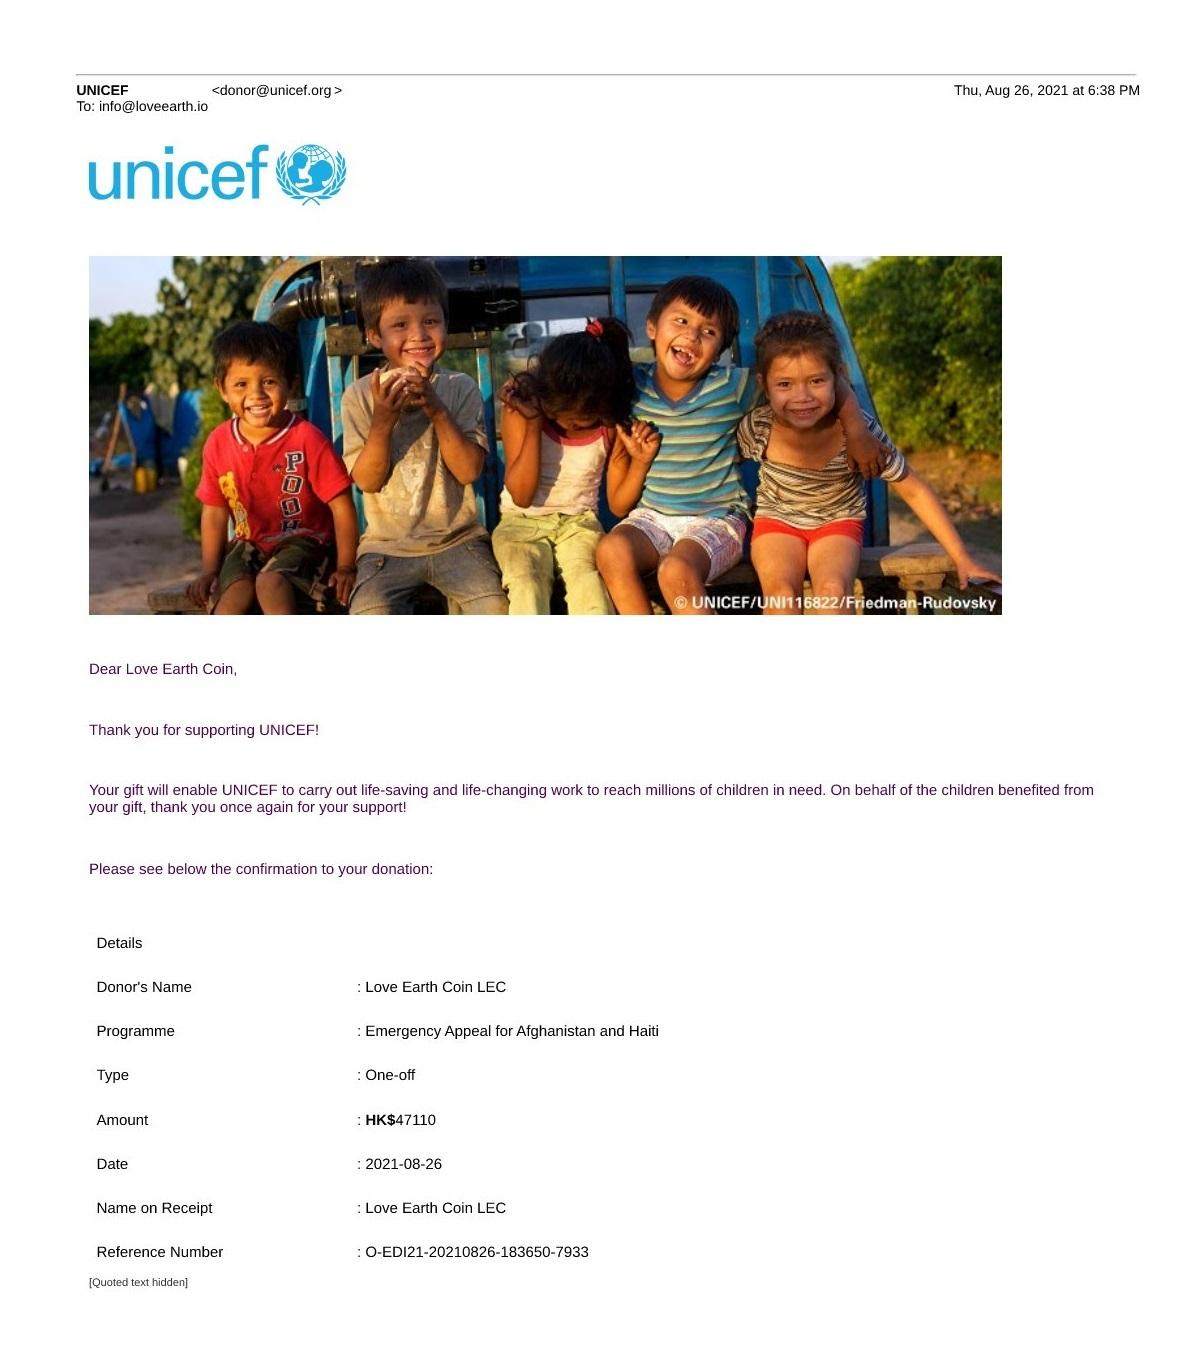 UNICEF_Haiti_6050_mail_2_no_ad